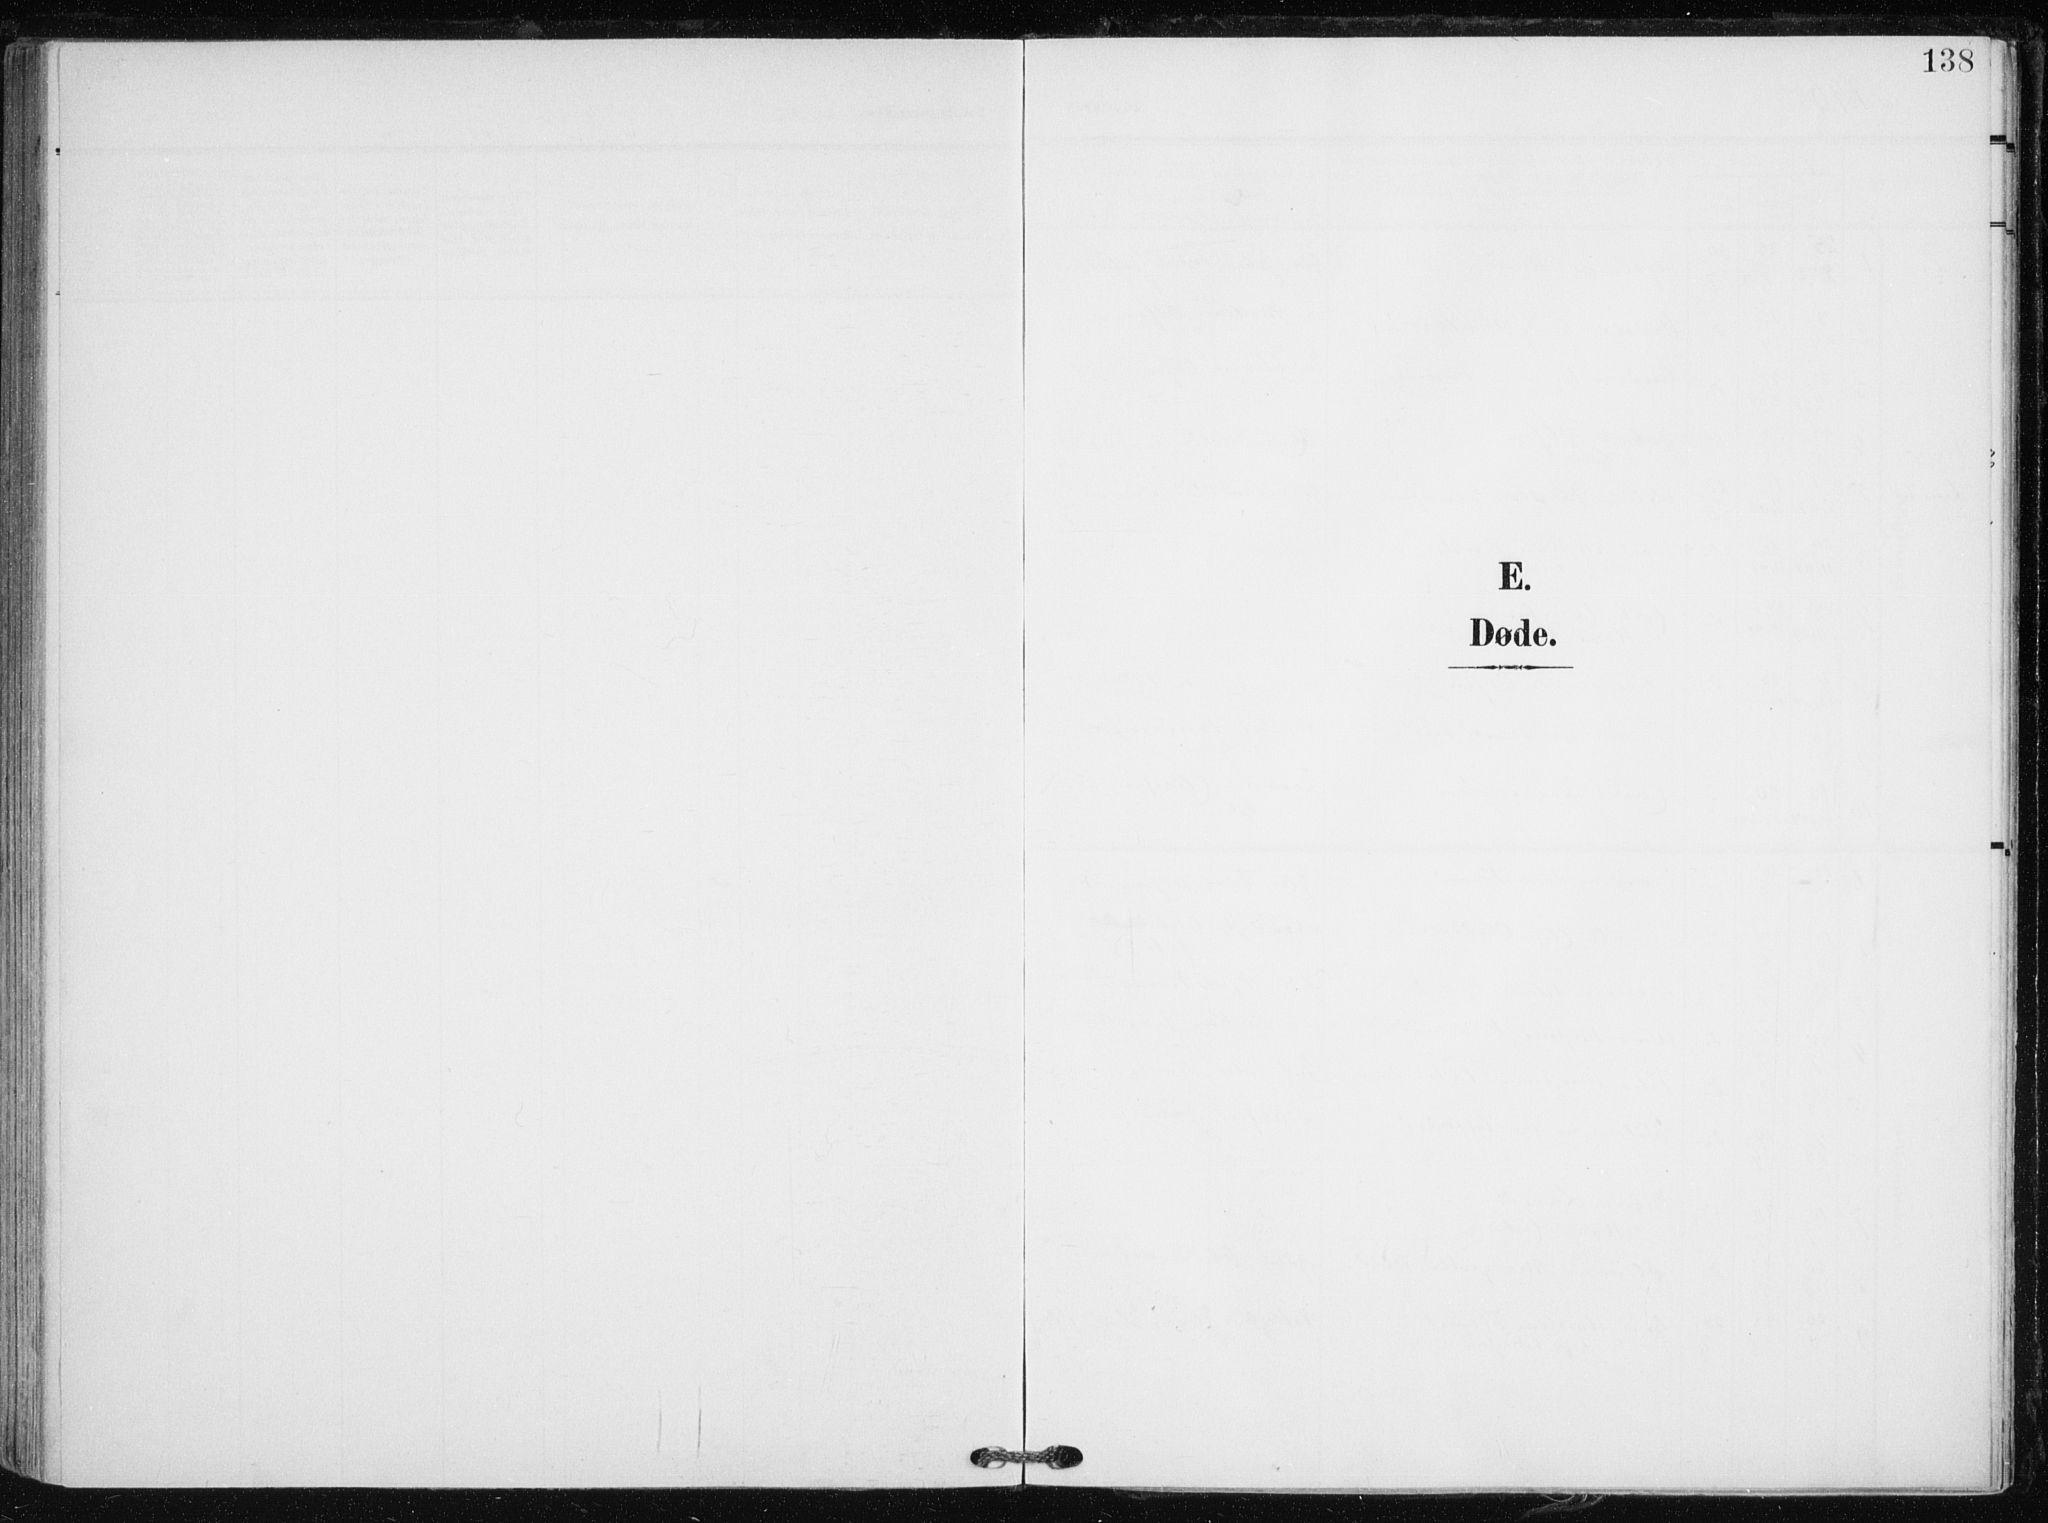 SATØ, Tranøy sokneprestkontor, I/Ia/Iaa/L0012kirke: Ministerialbok nr. 12, 1905-1918, s. 138